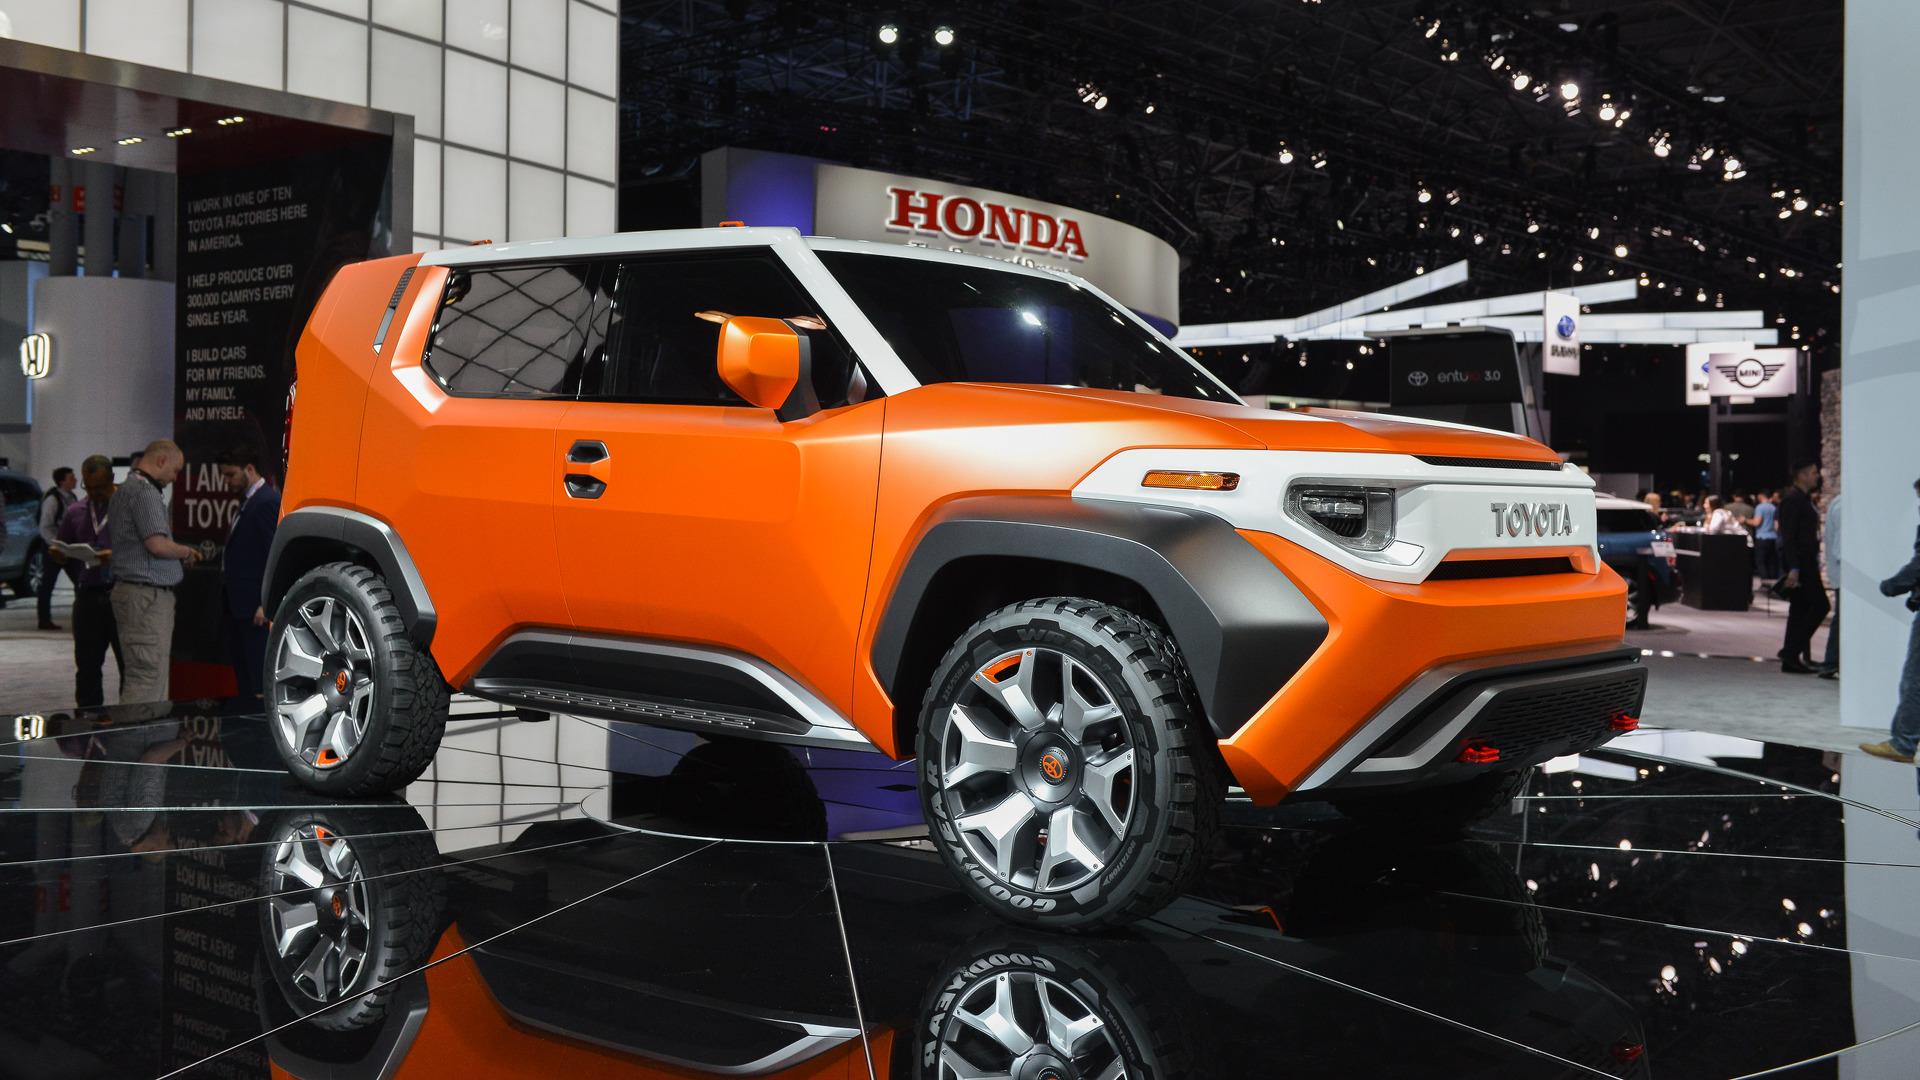 Toyota Hints At FJ Cruiser Revival To Take On The Wrangler